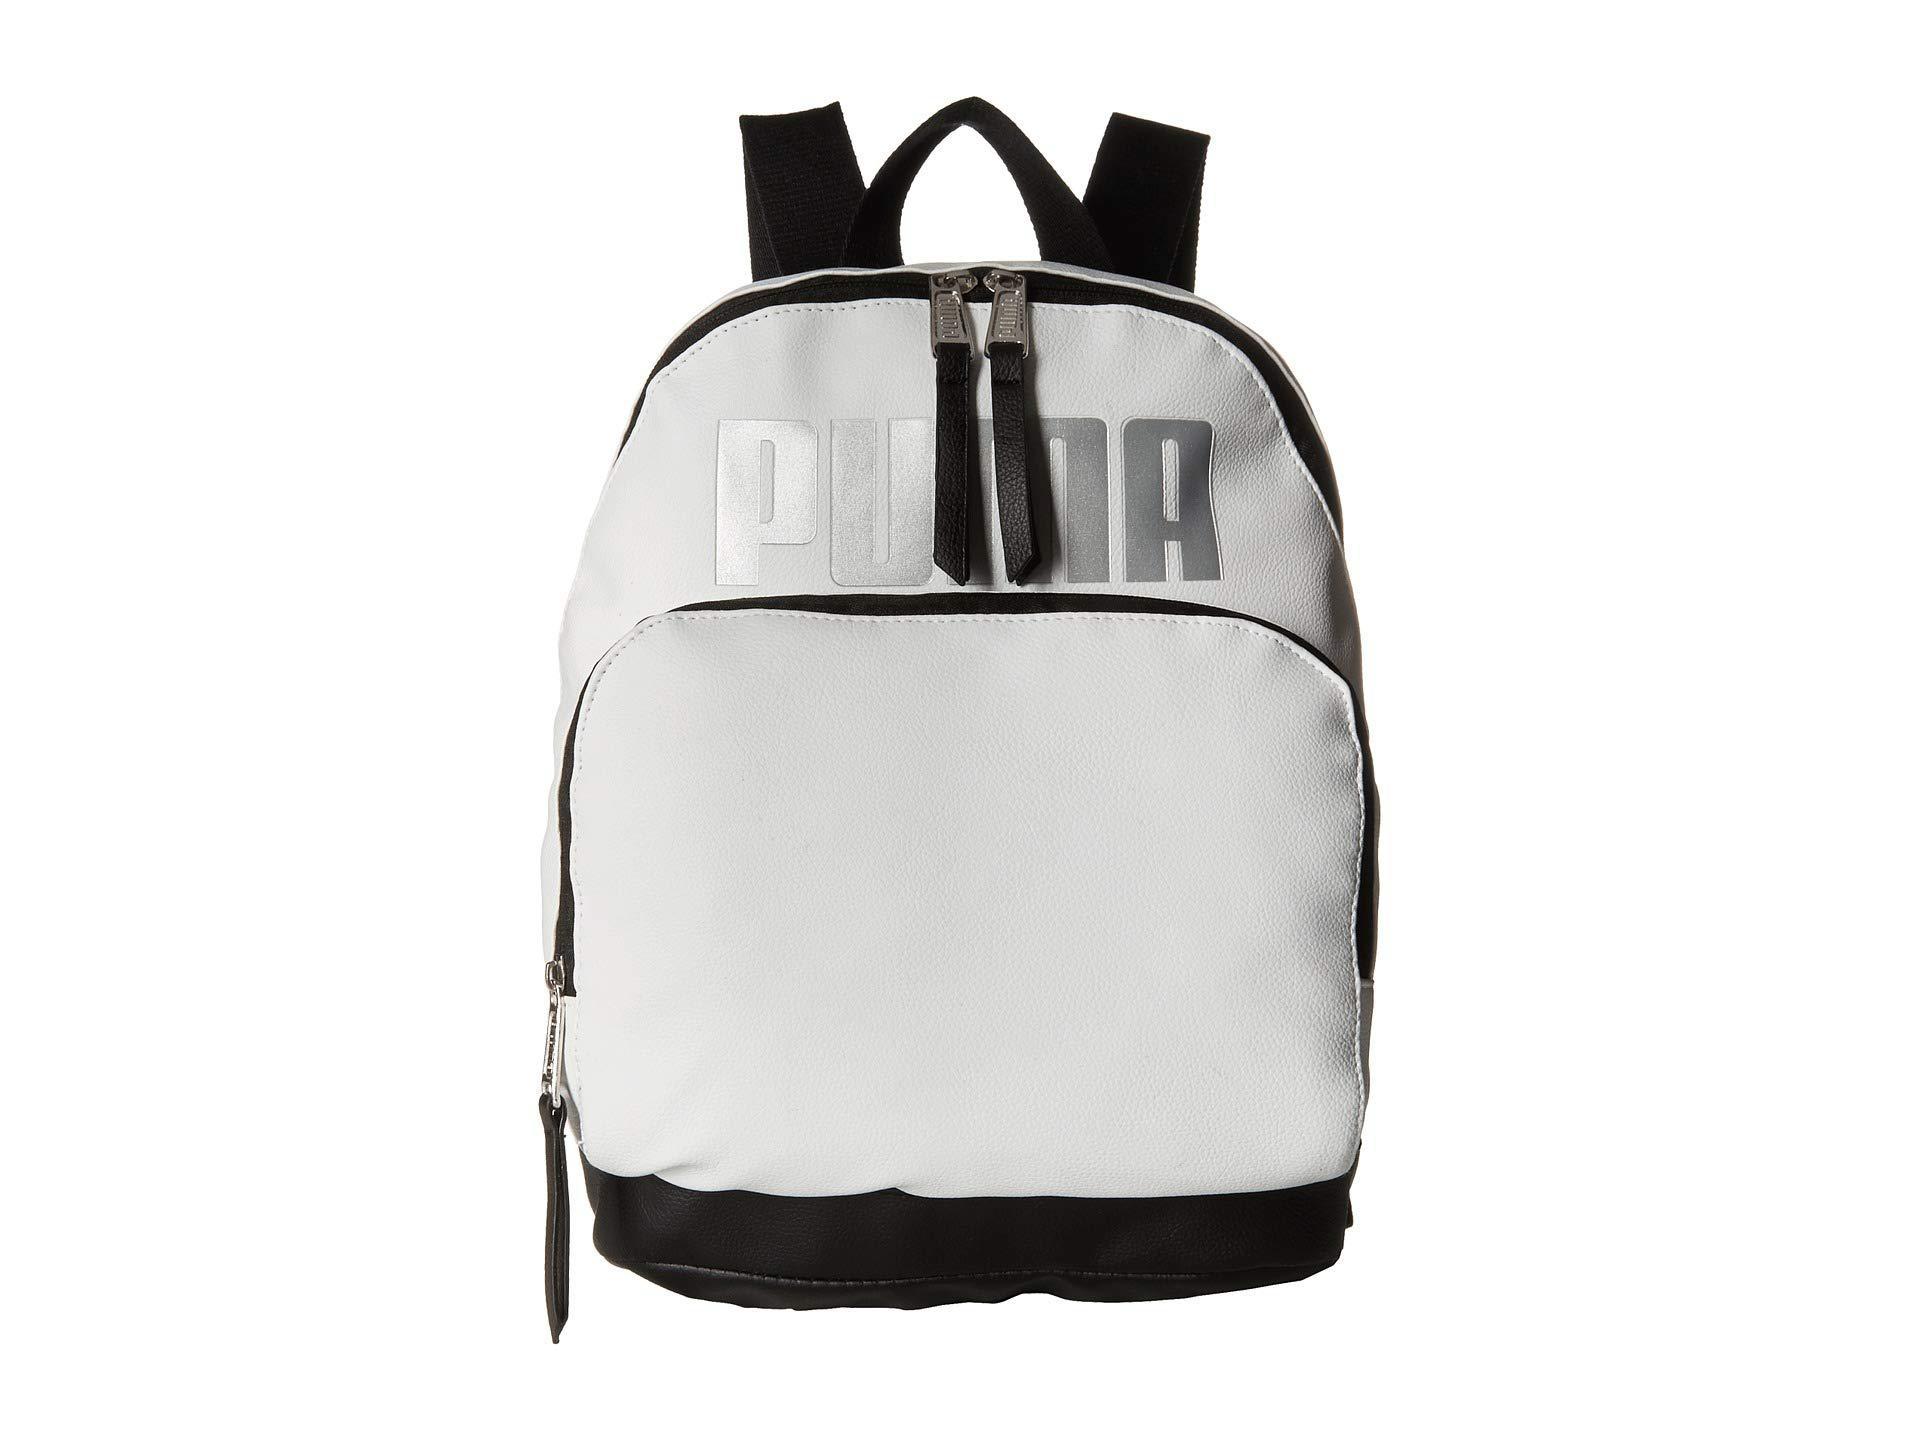 Lyst - PUMA Evercat Royal Pu Backpack in Black - Save 46% a148bb7c68c4f